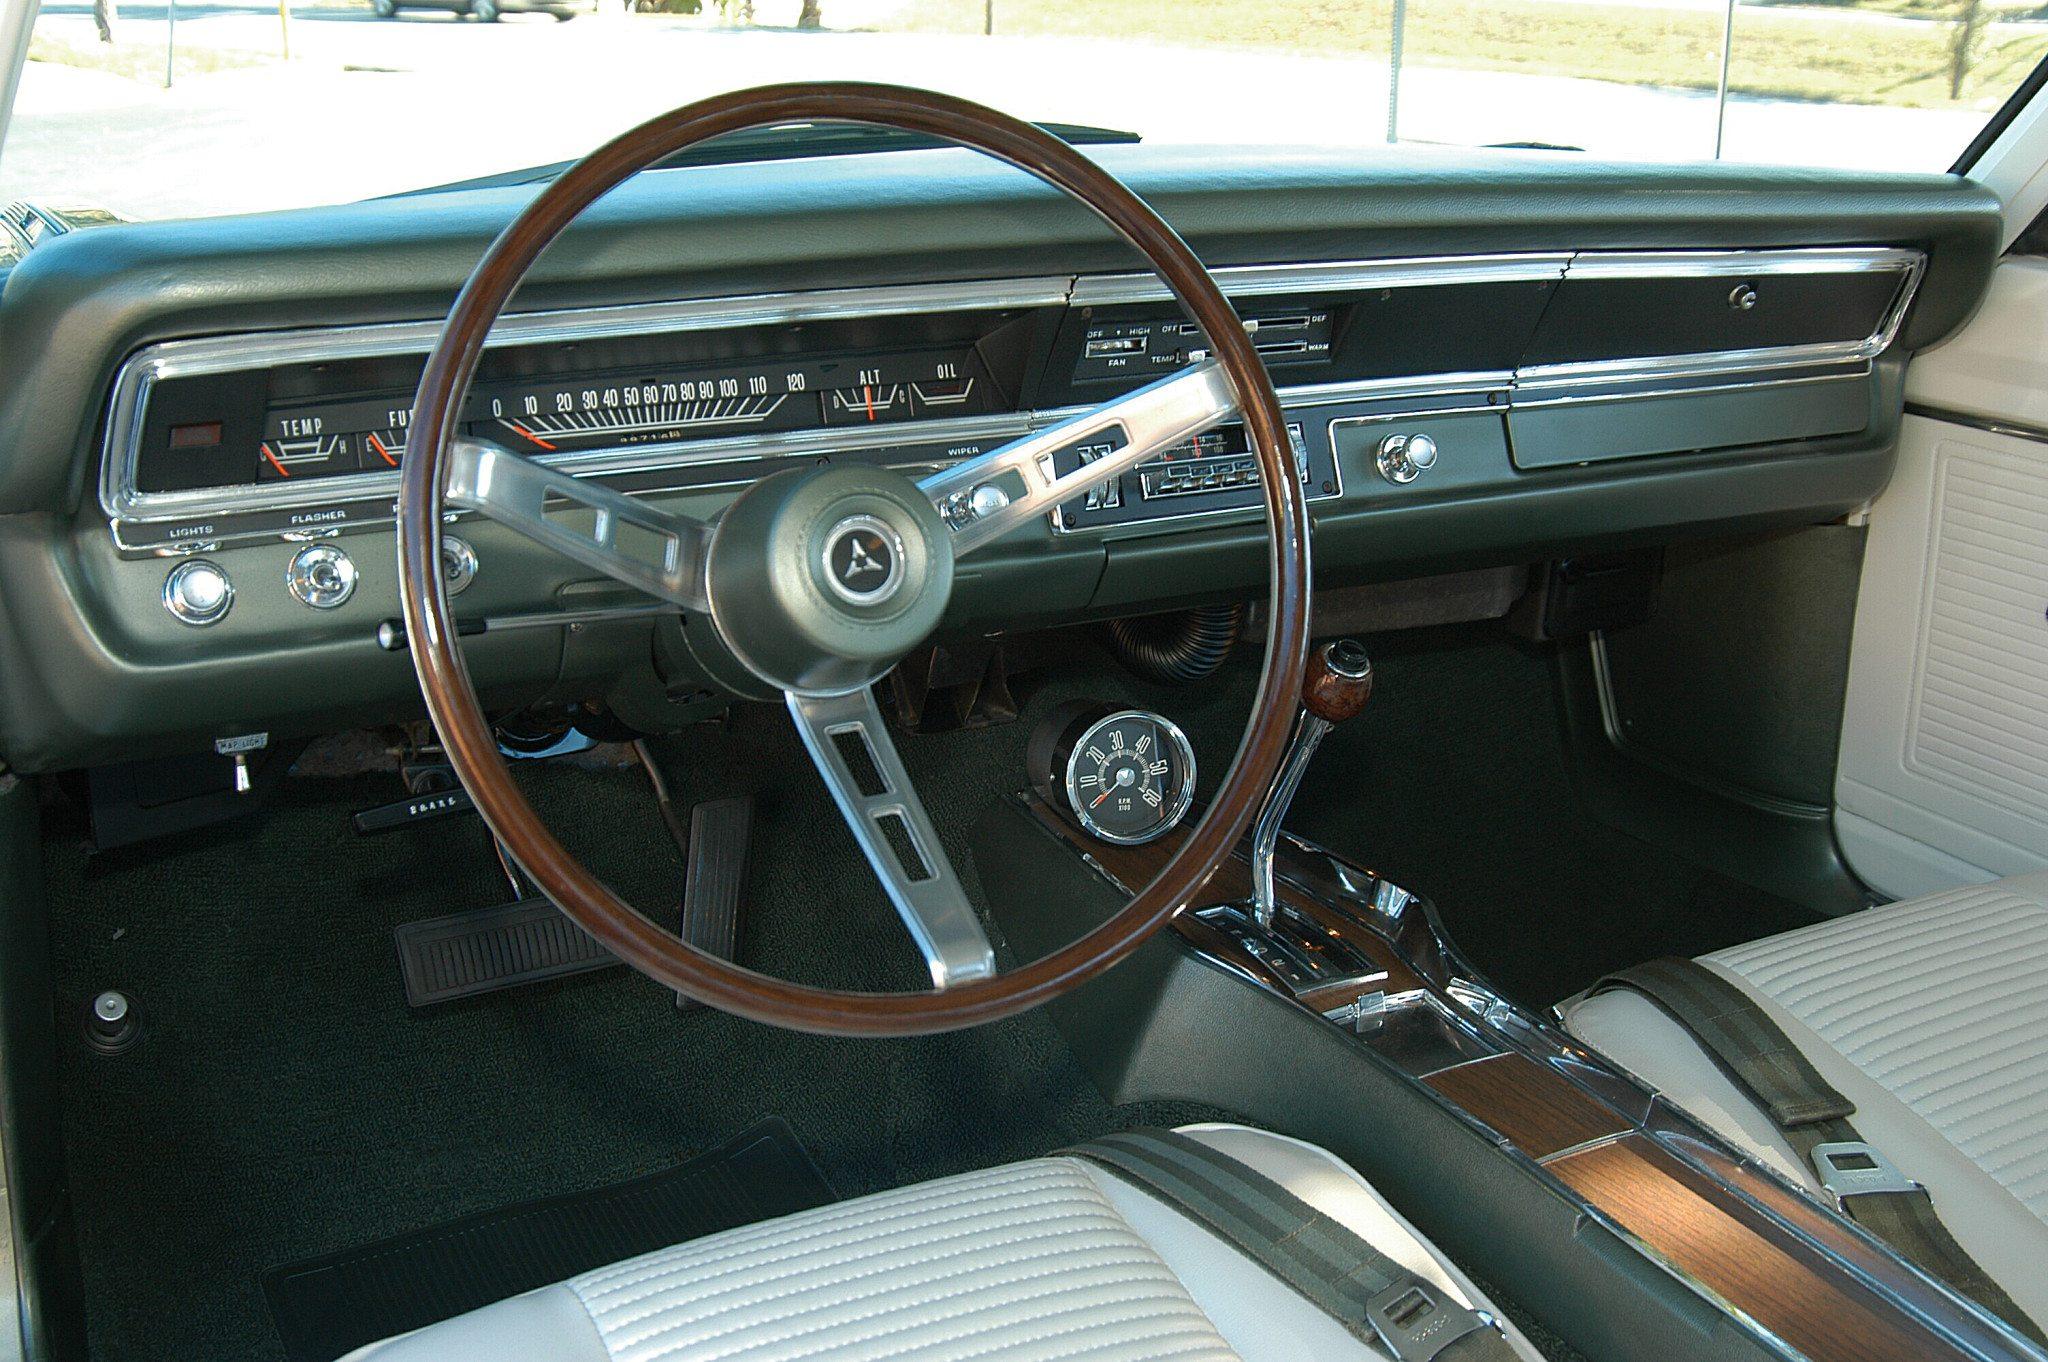 1969 Dodge Dart Gts Heacock Classic Insurance